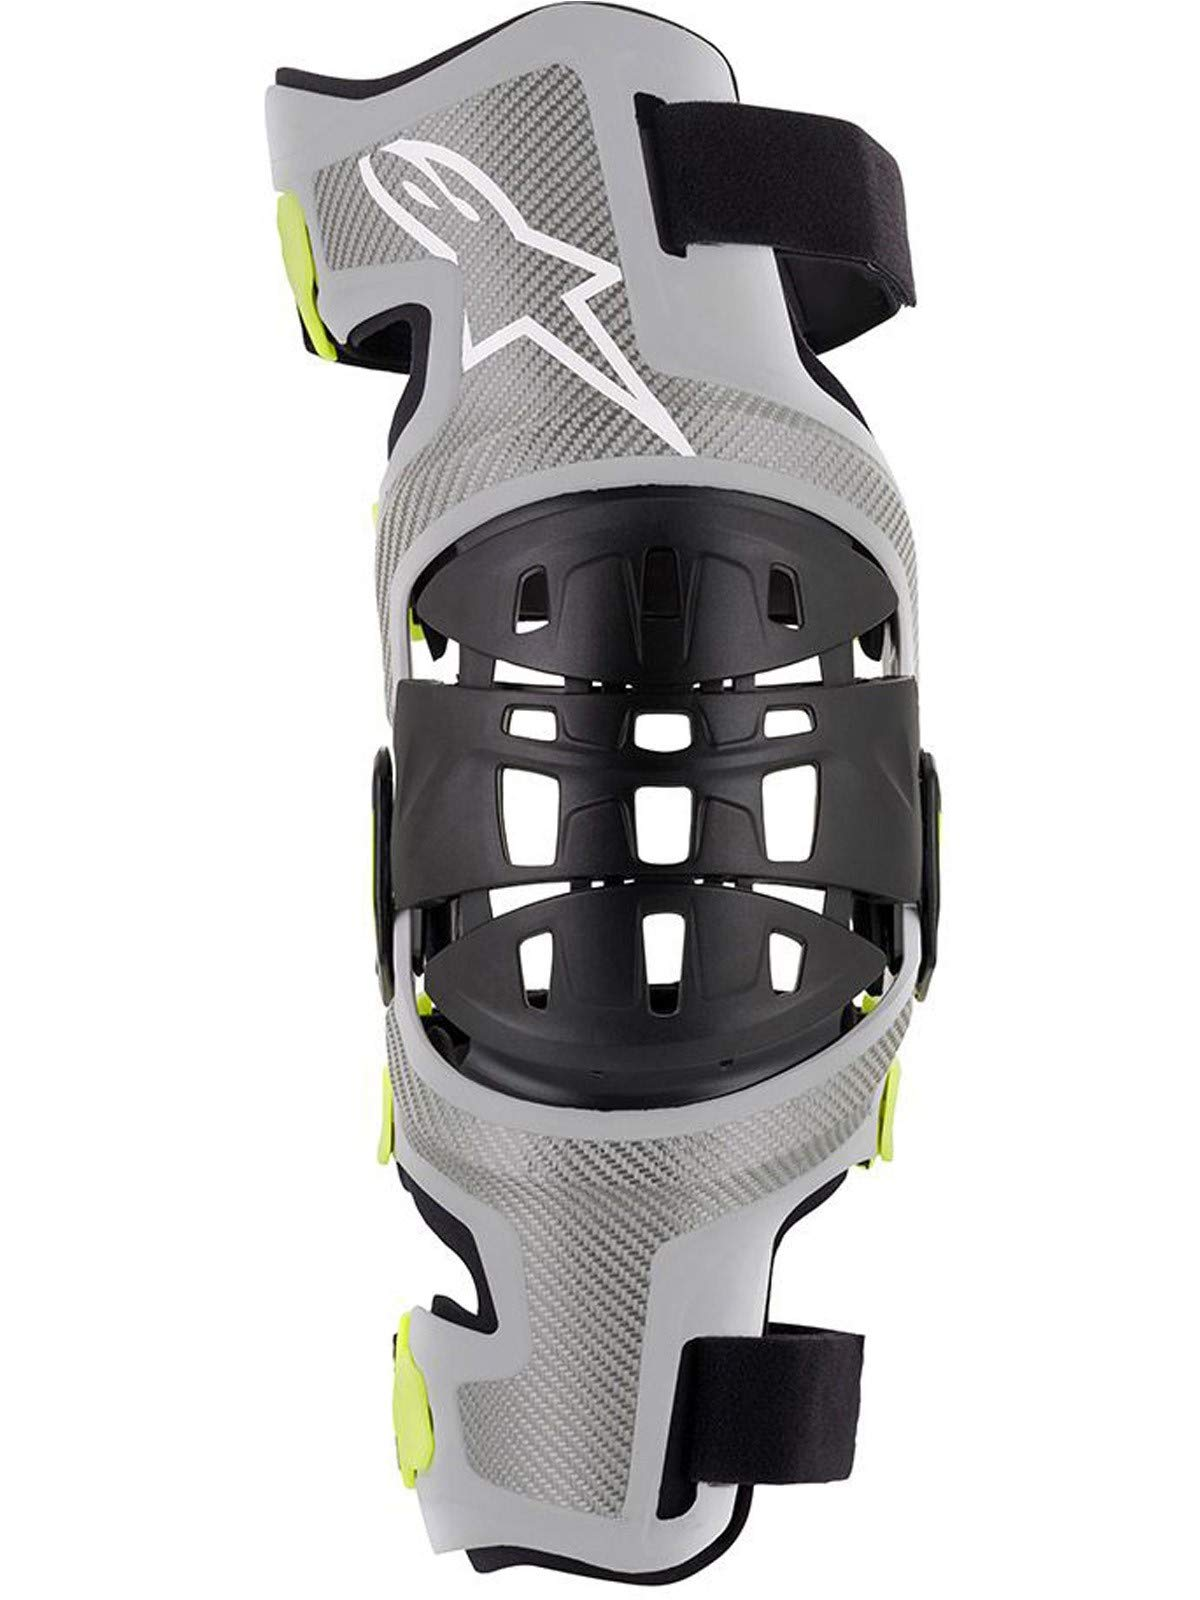 Bionic-7 Off-Road Motocross Knee Brace Set (Medium, Silver Yellow Fluo) by Alpinestars (Image #2)